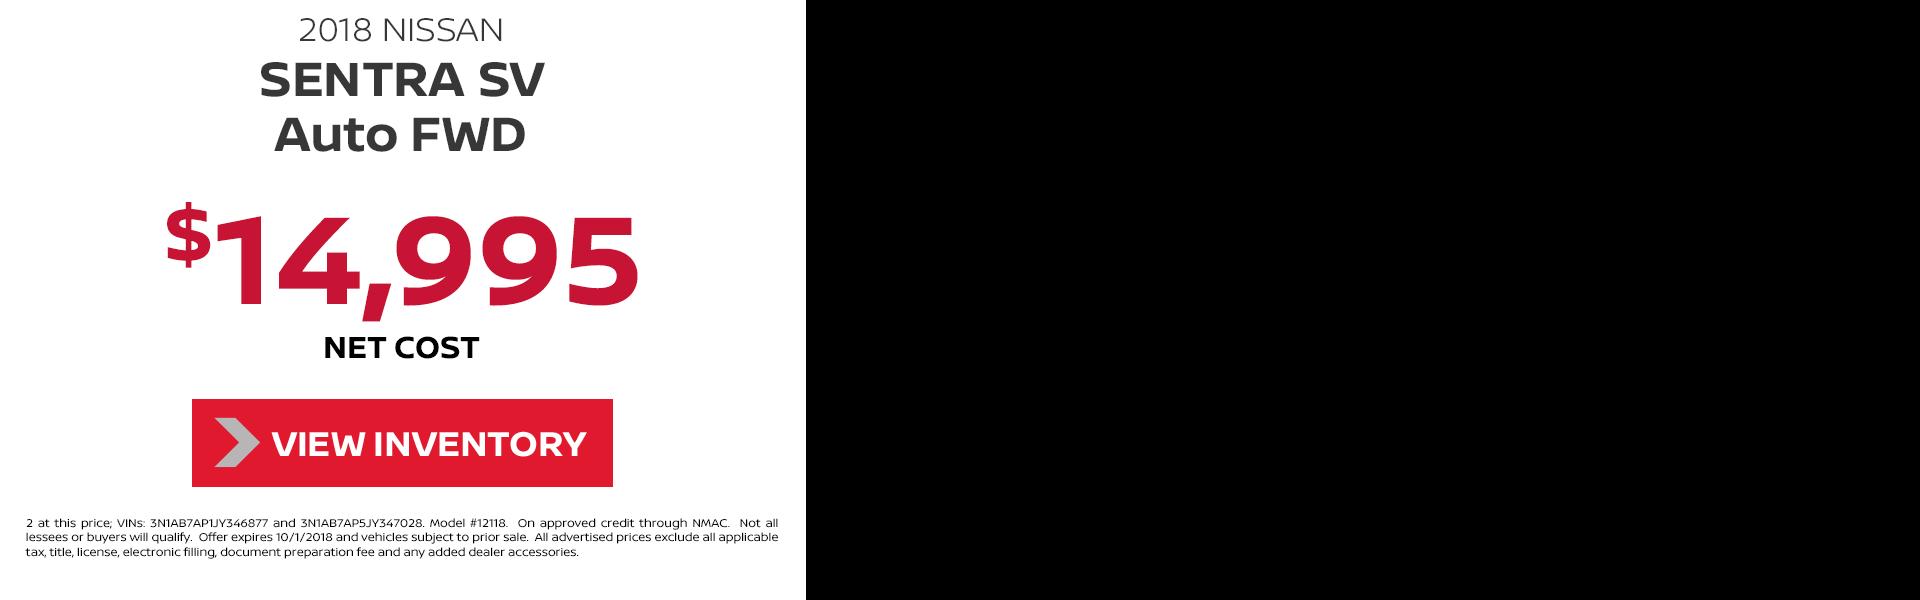 2018 Nissan Sentra Ad Video